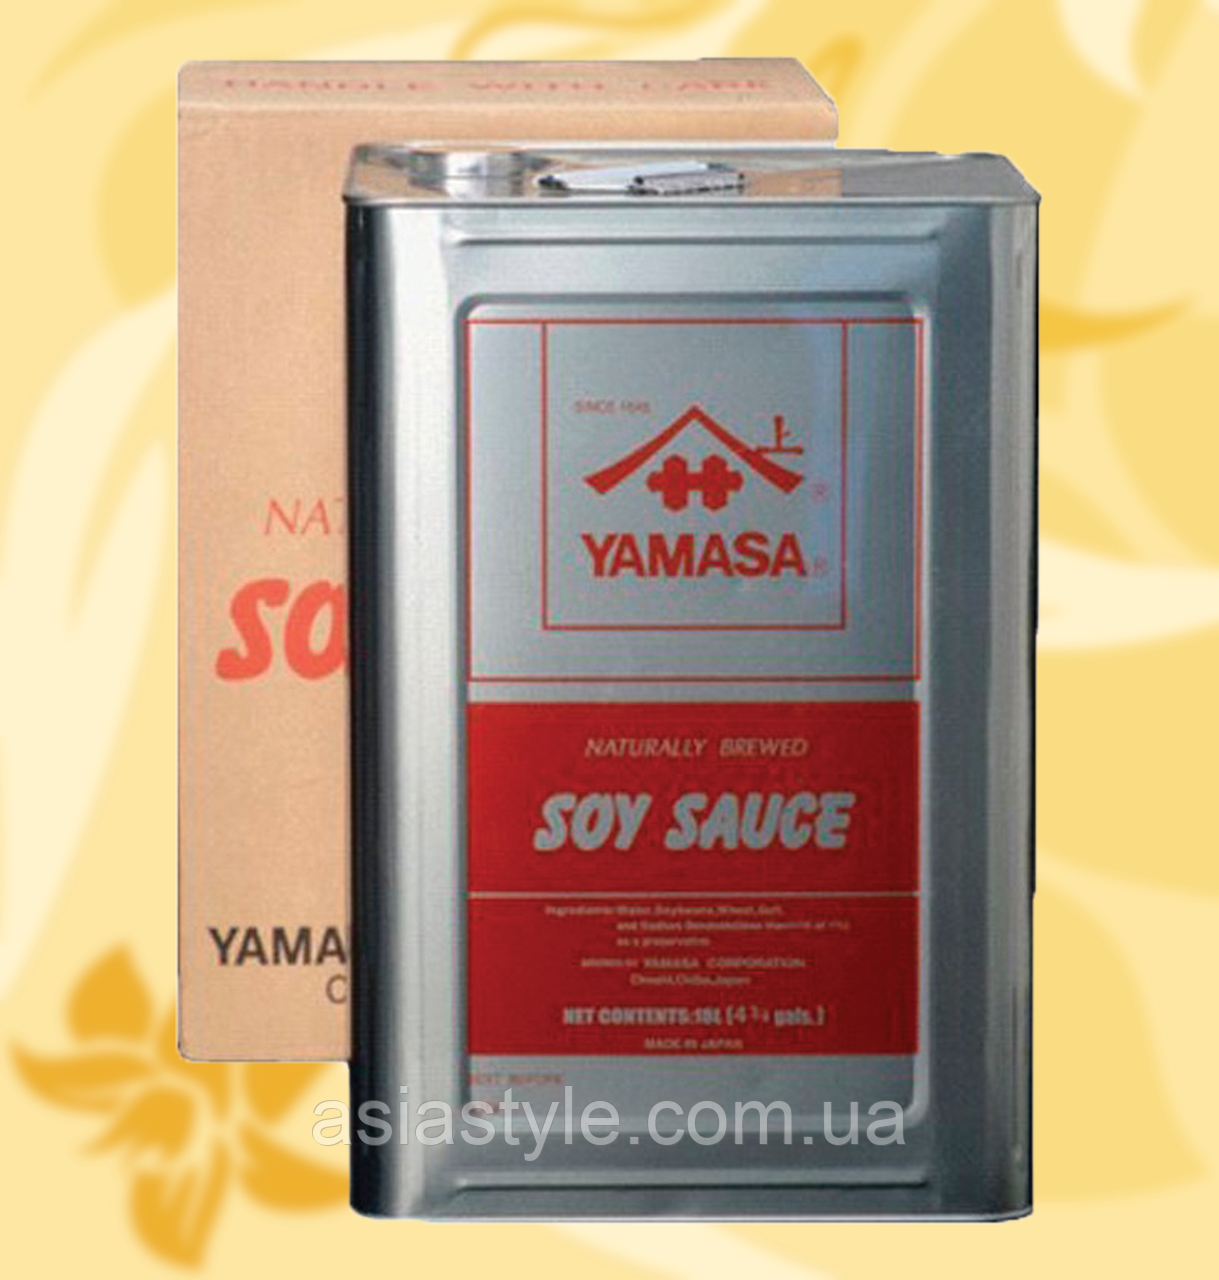 Соус соєвий класичний, Ямаса, преміум, Soy Sauce Premium, Yamasa, 18l, жб, Мо